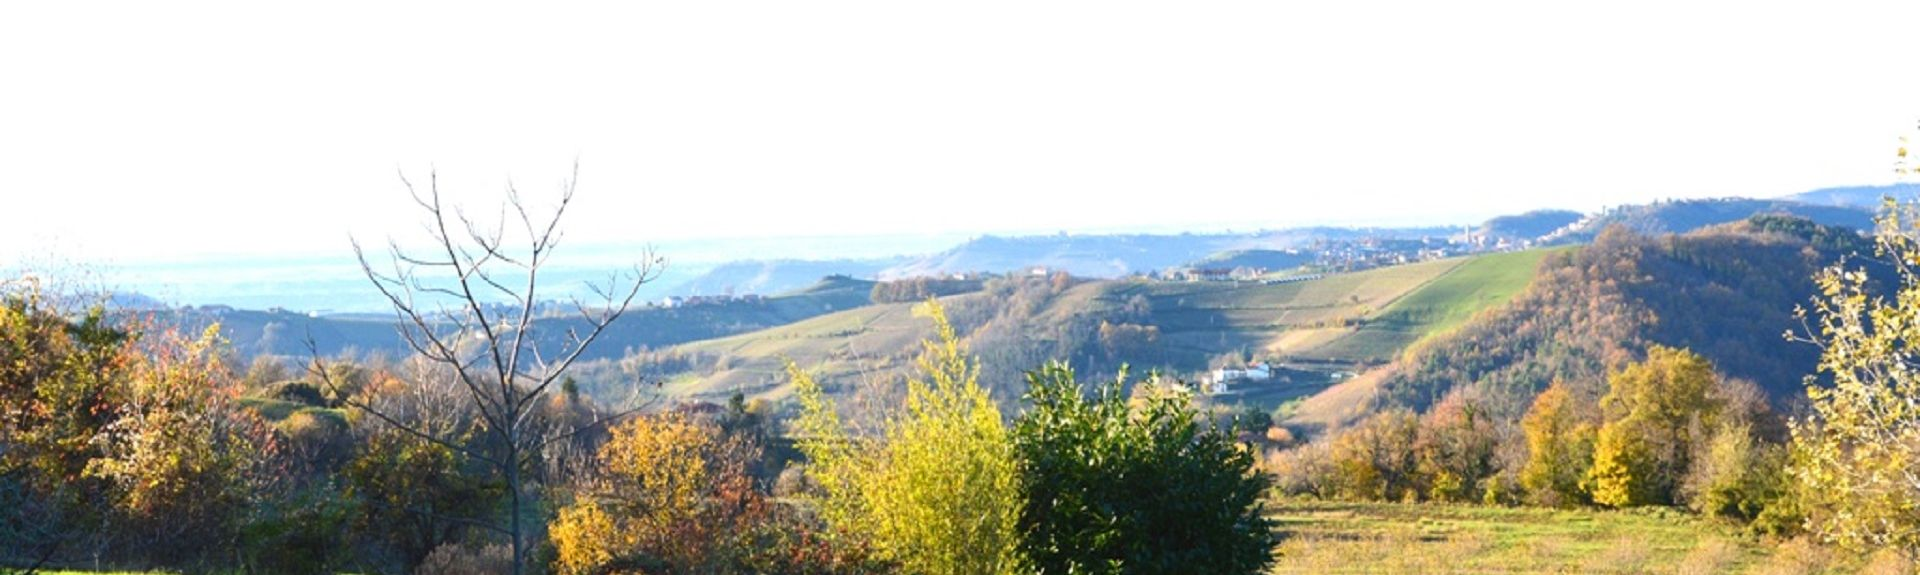 Serralunga d'Alba, Cuneo, Piedmont, Italy